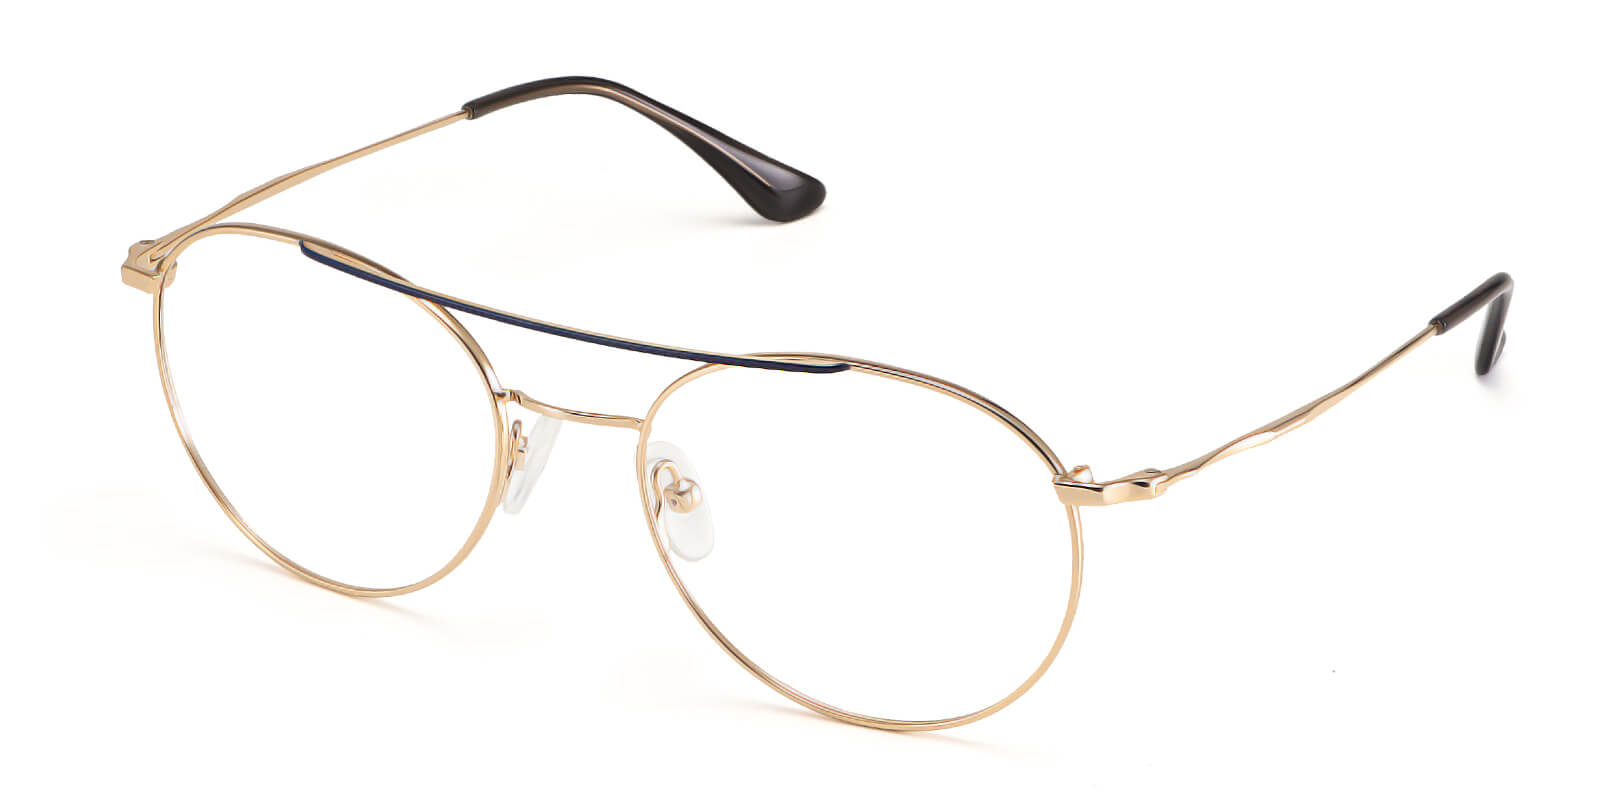 Glitz-3 colors aviator eyeglasses